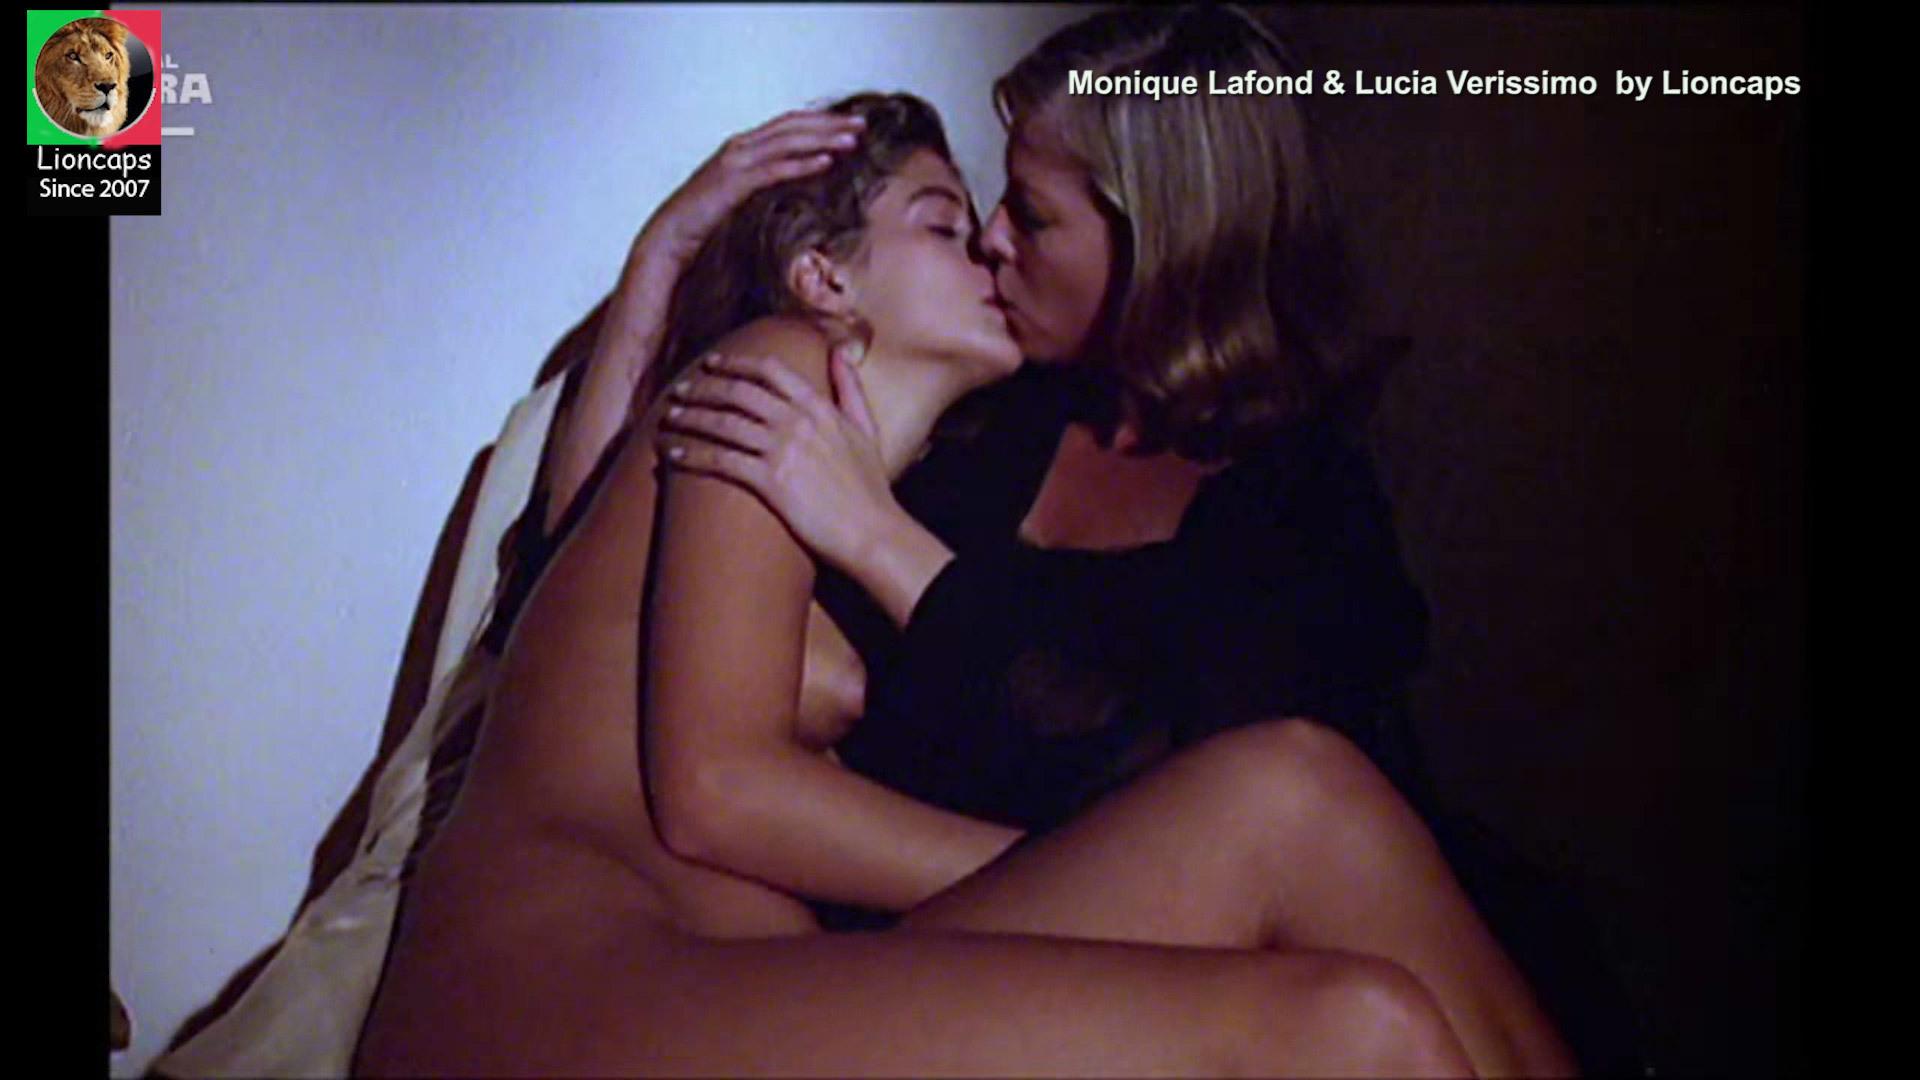 lucia_verissimo_monique_lafond_feras_lioncaps_14_02_2021 (8).jpg